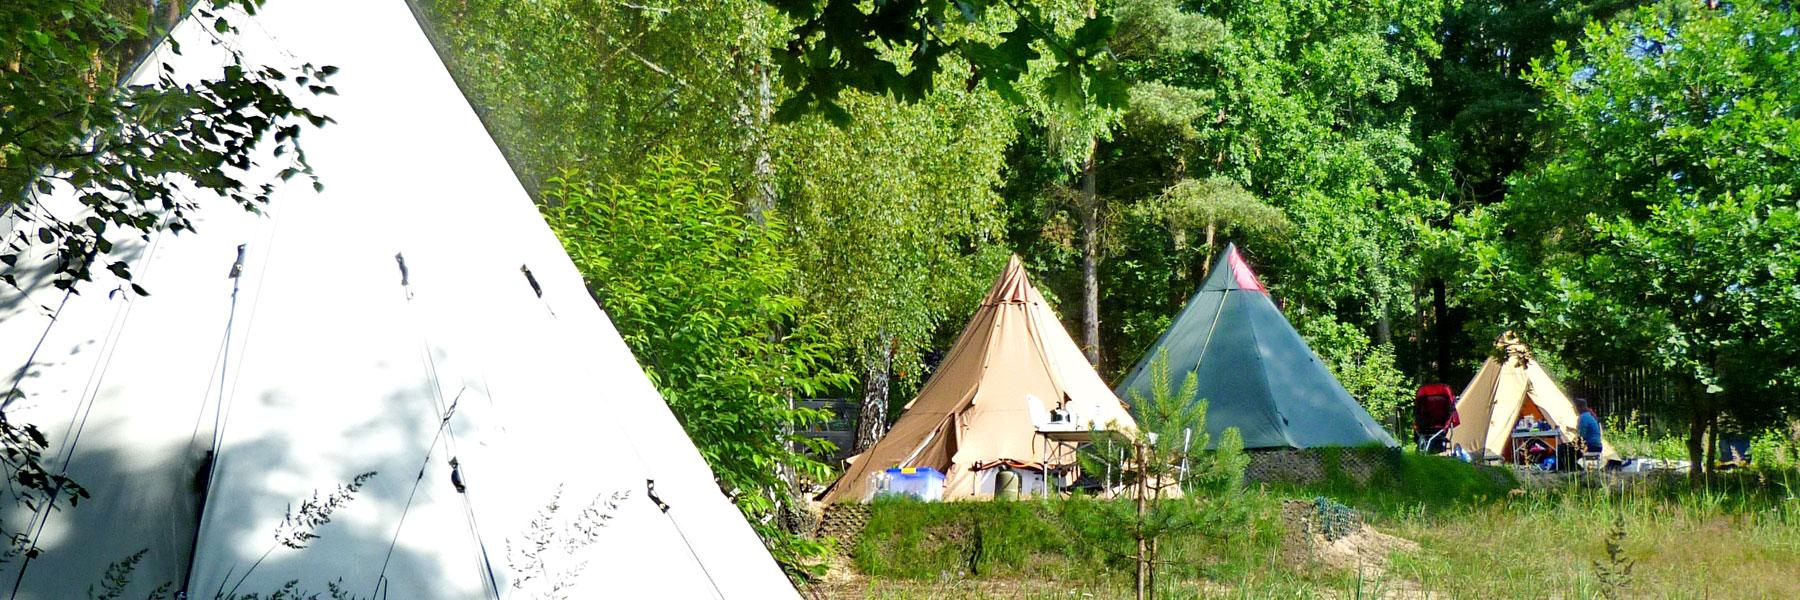 Zelte - Campingplatz Am Gobenowsee